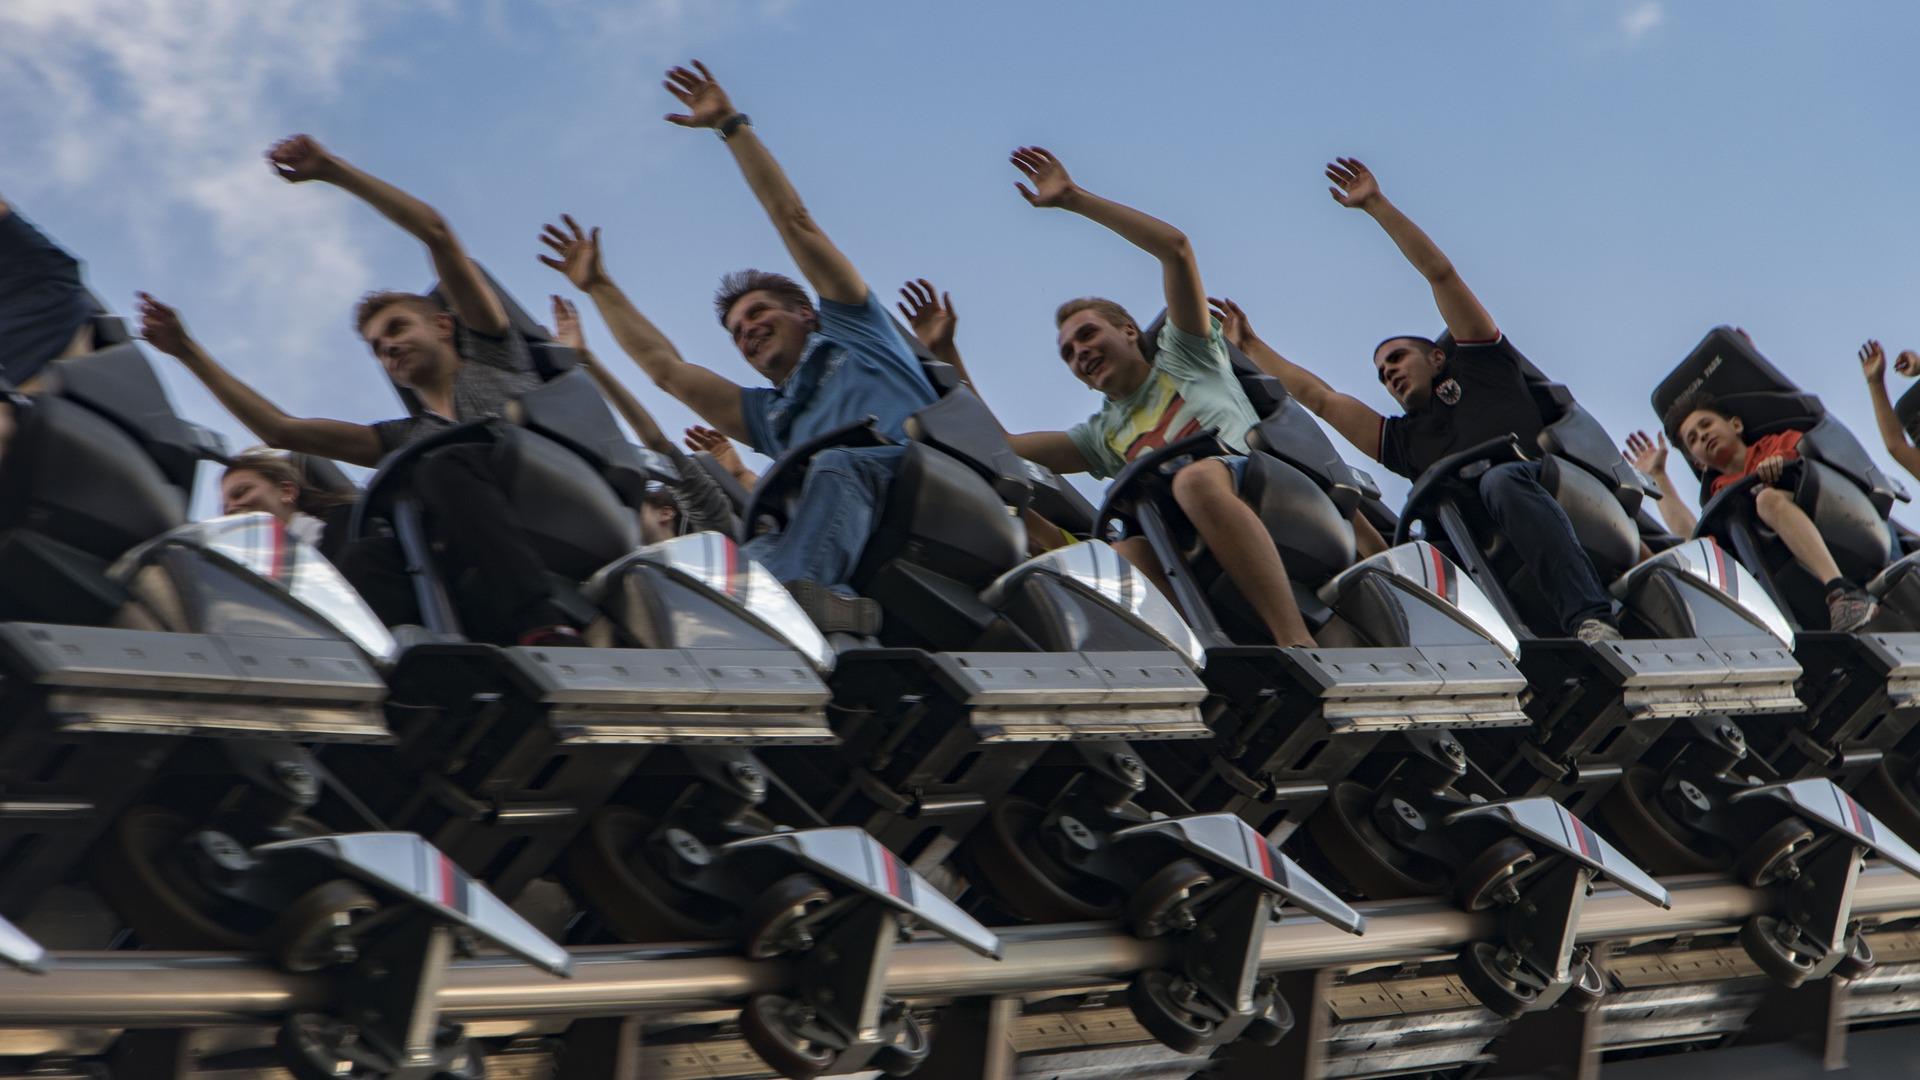 rollercoaster-2347516_1920